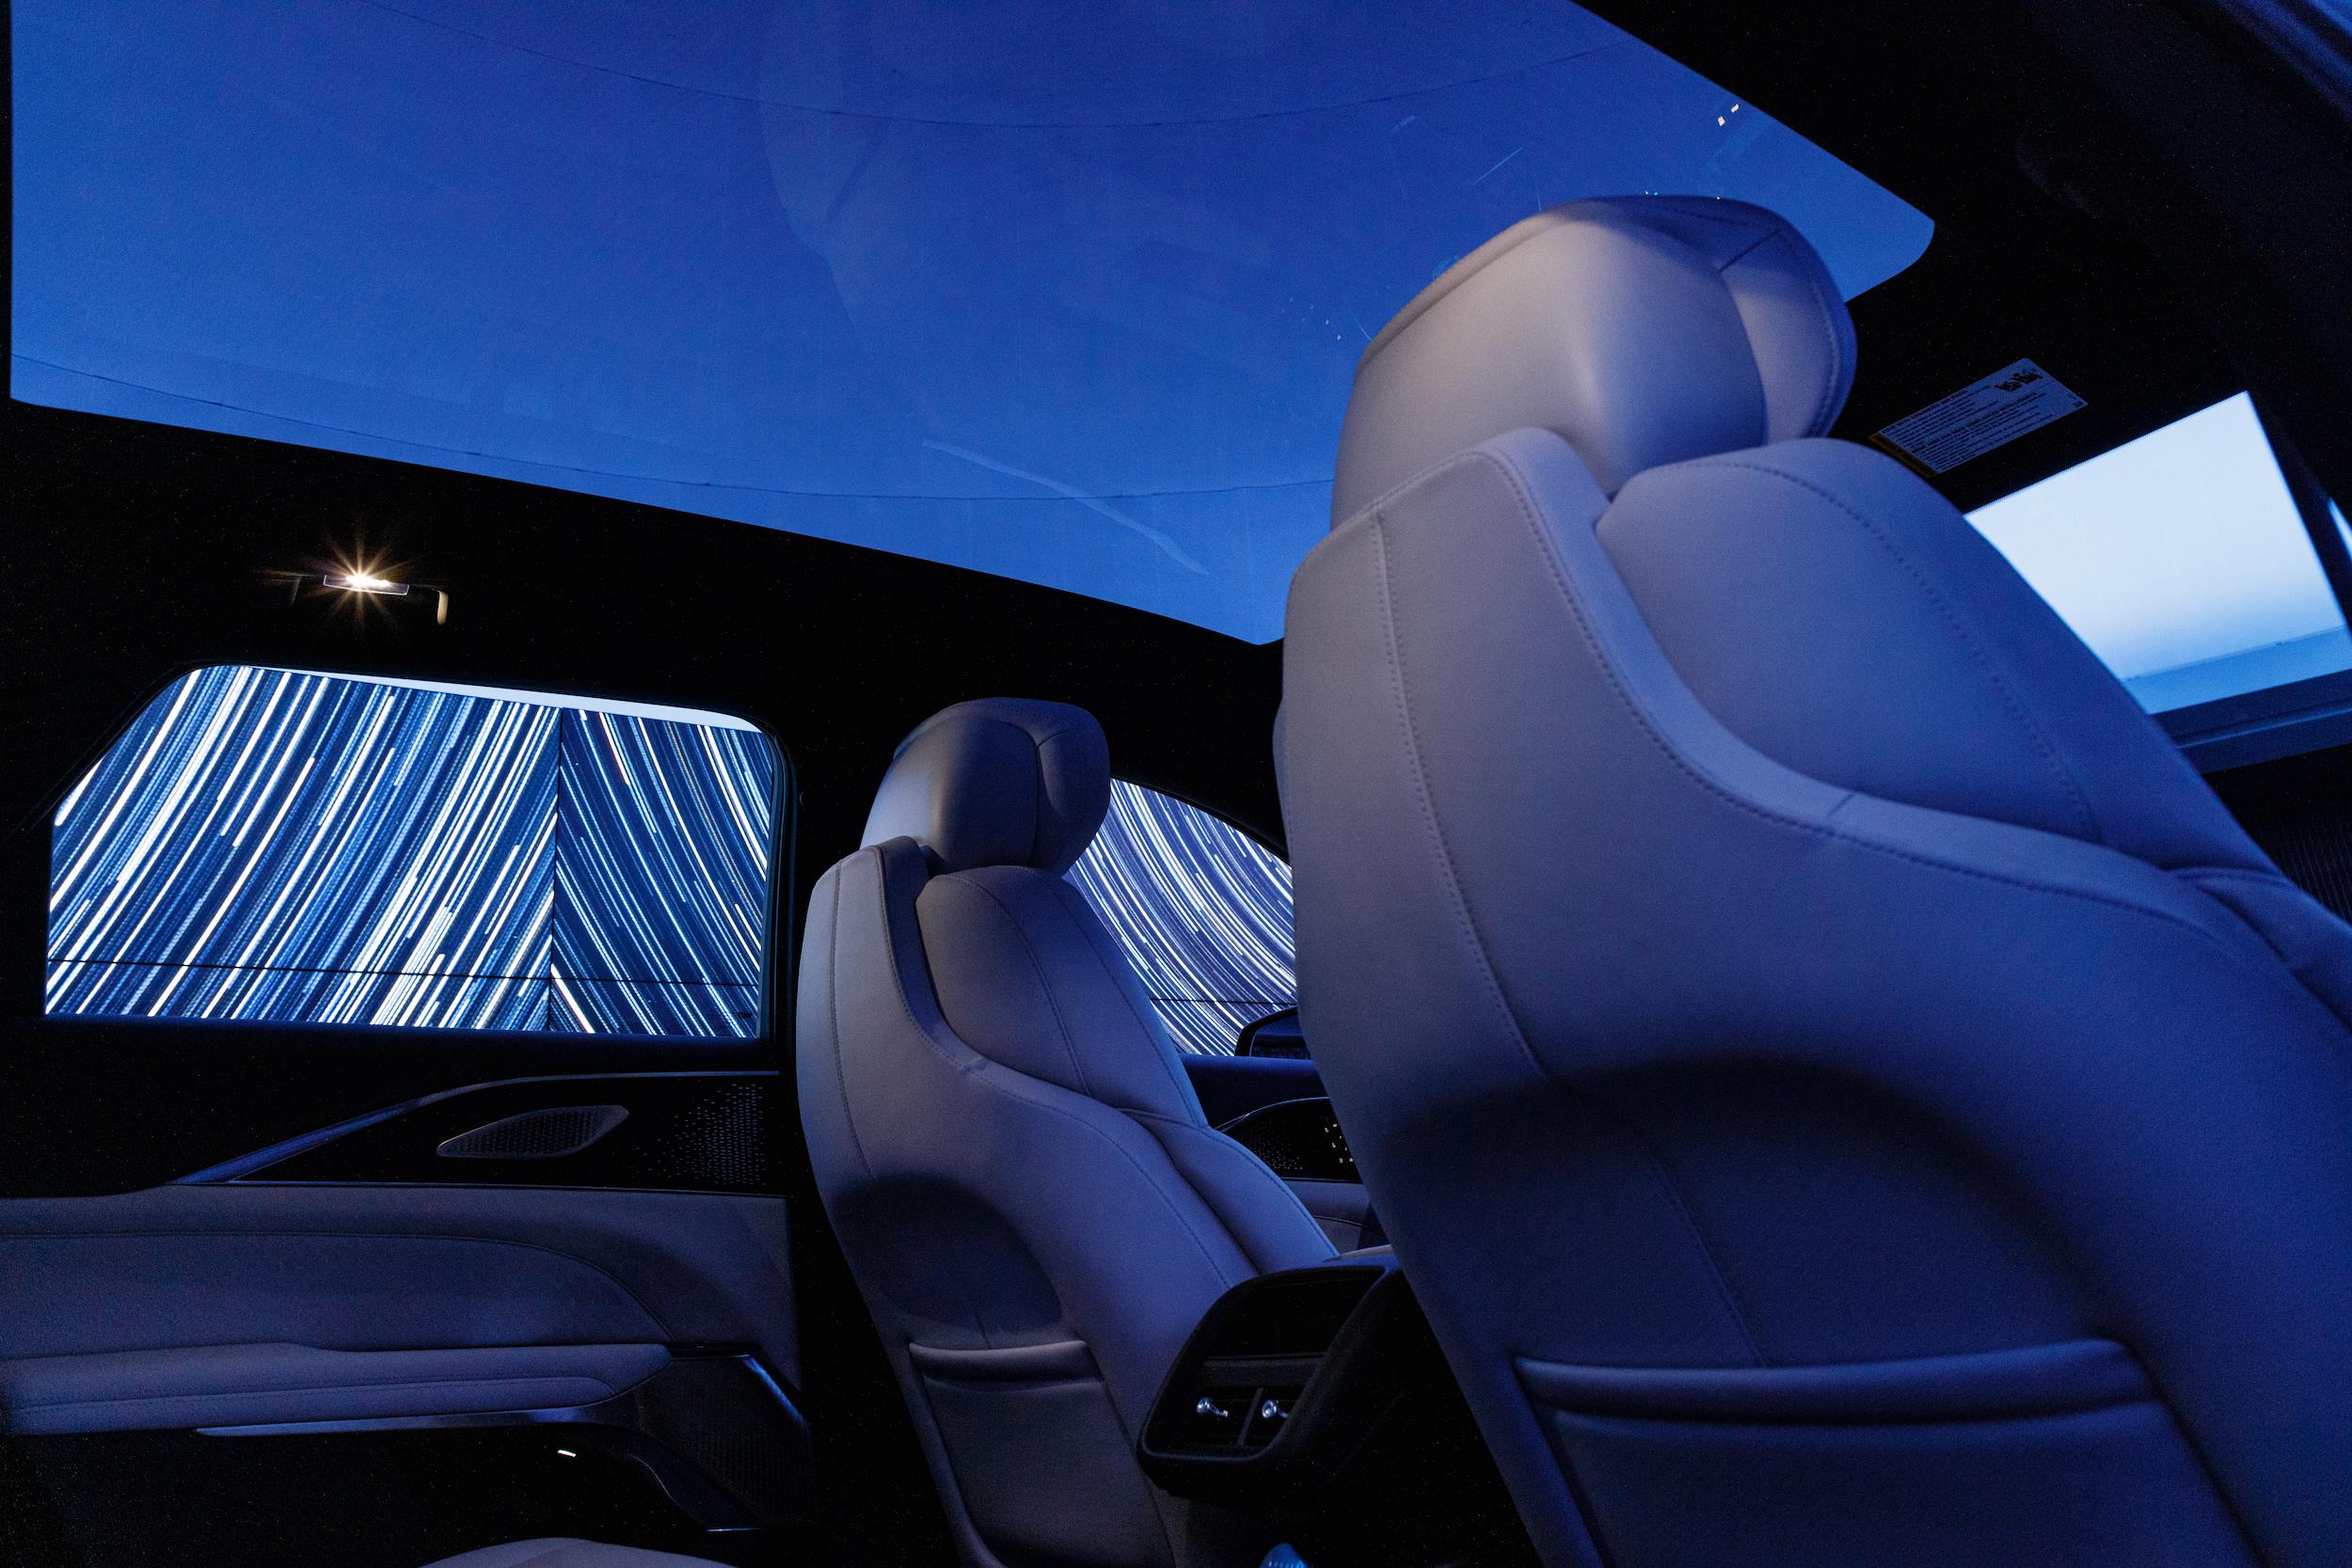 2023 Cadillac Lyriq interior moonroof